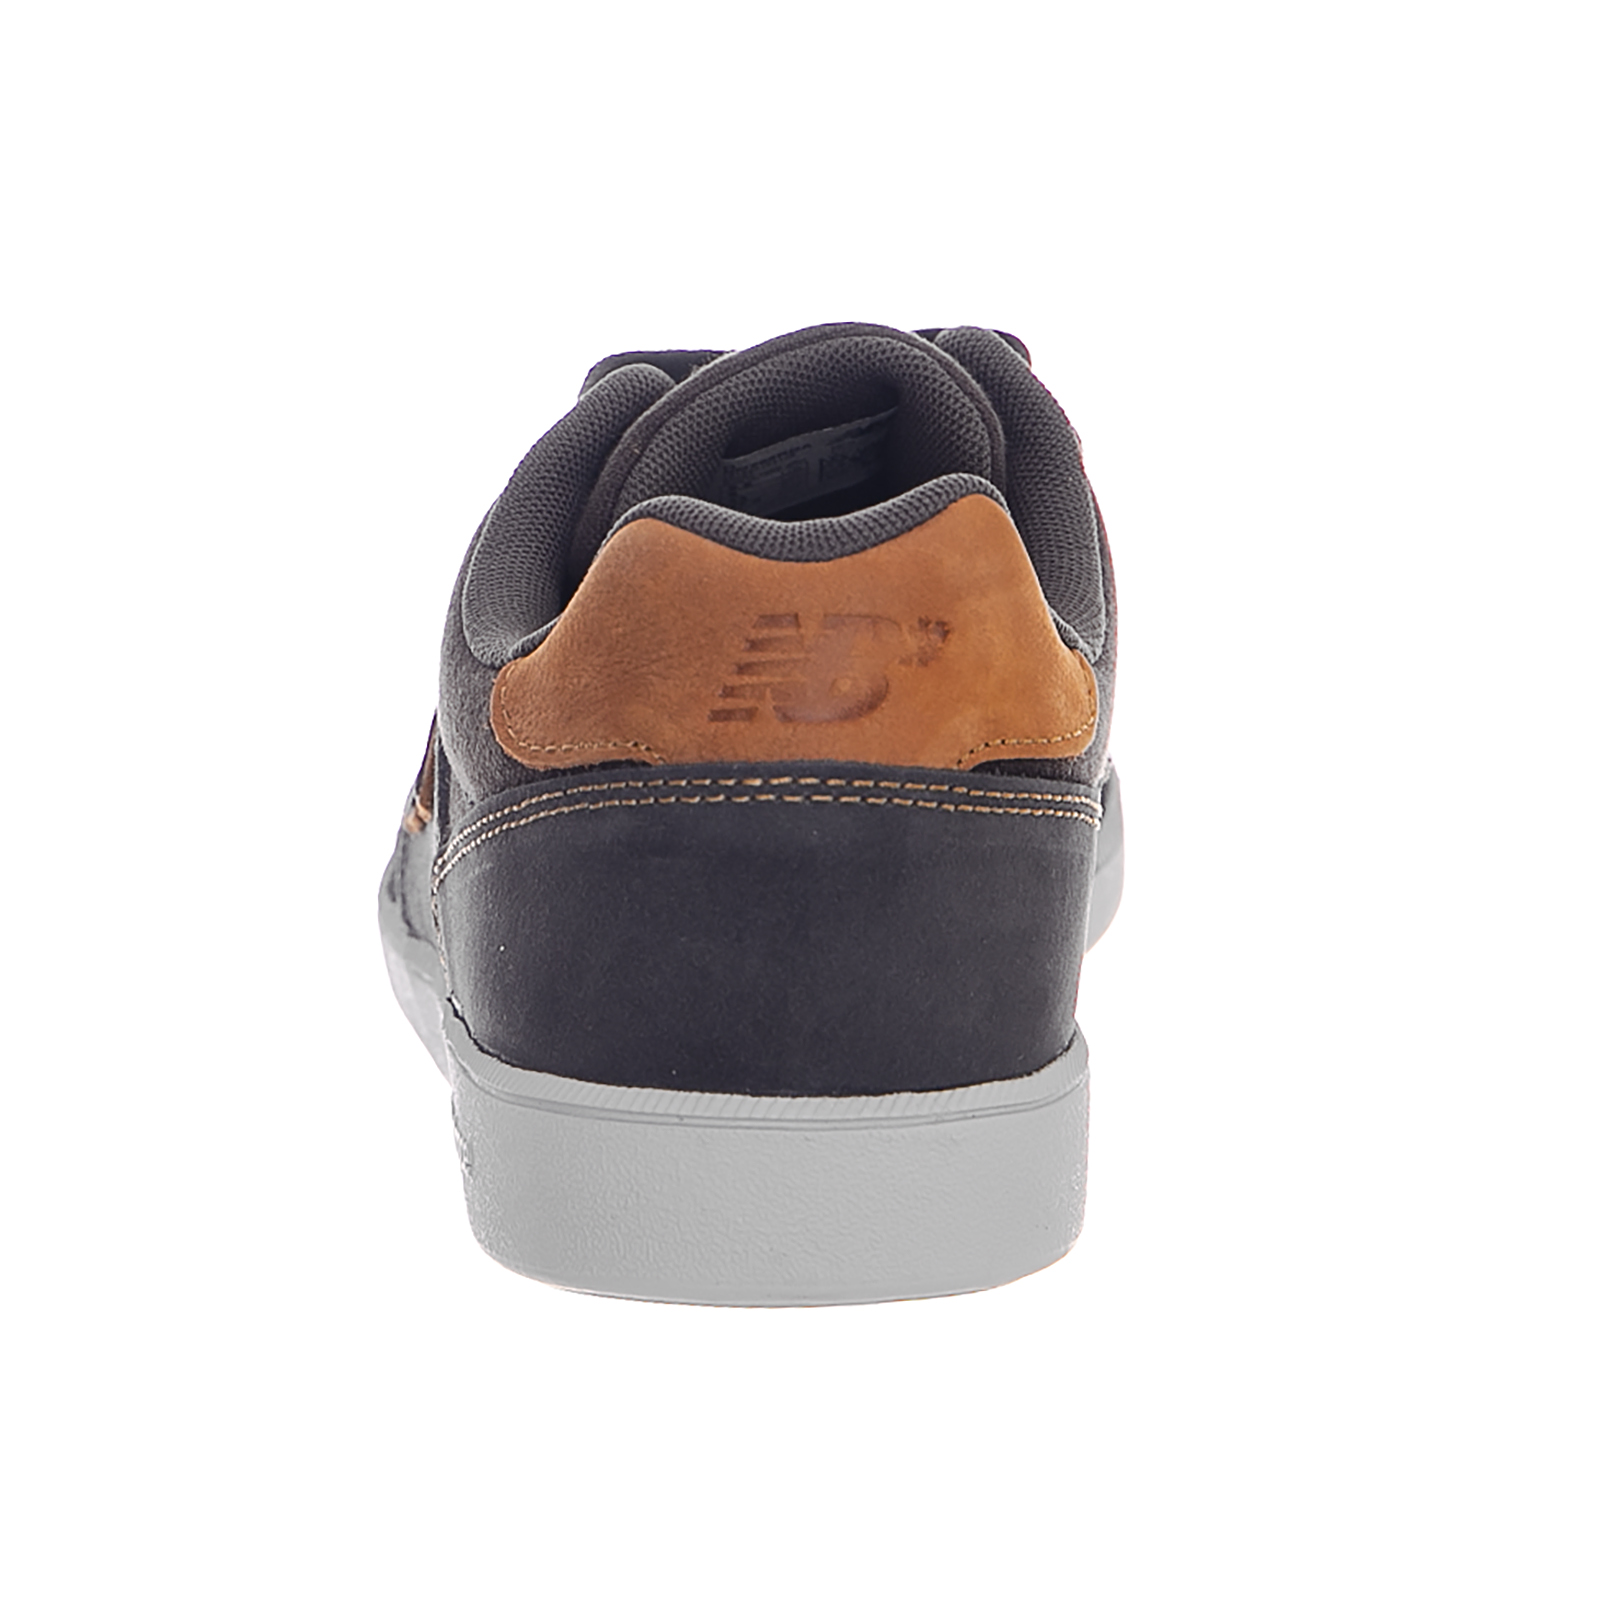 gris Noir Numeric Sneakers New Daim Synth Skateboarding Balance rnEIIqX